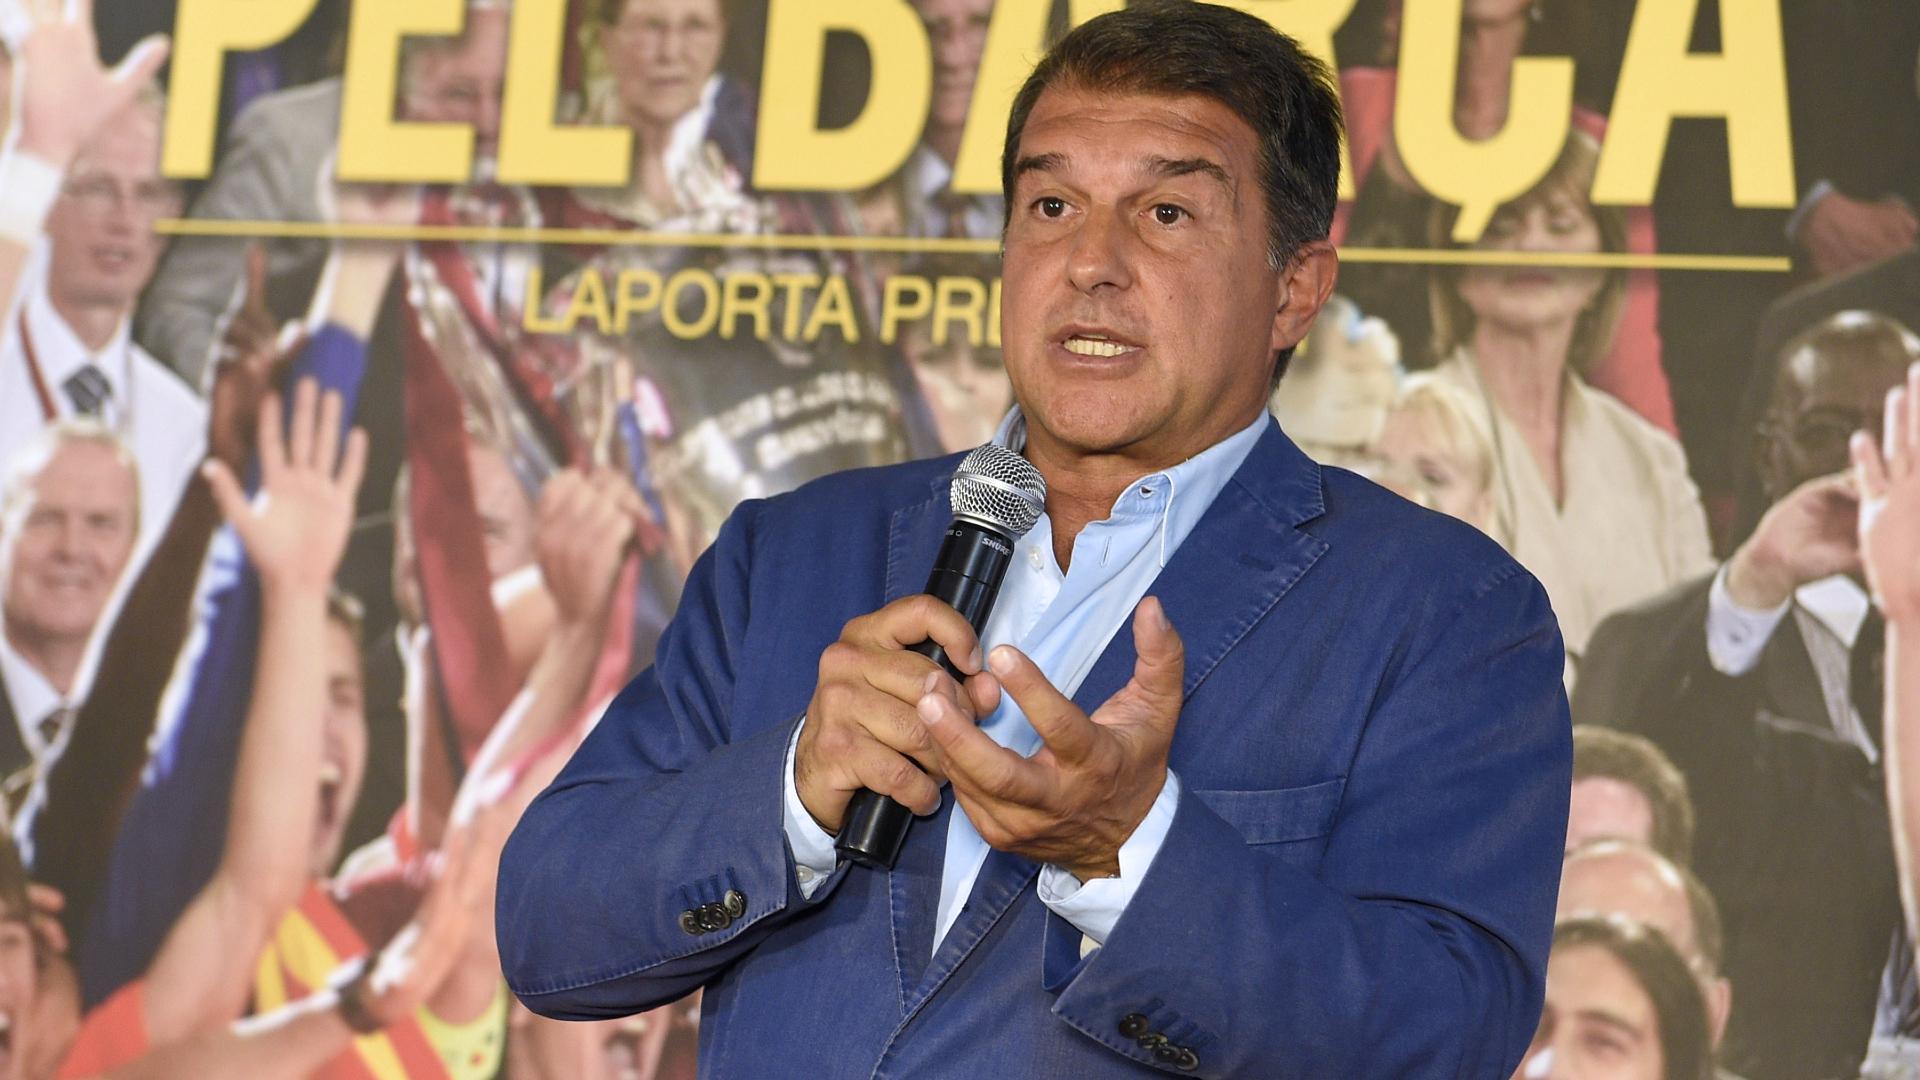 Joan Laporta confirms bid to return as Barcelona president